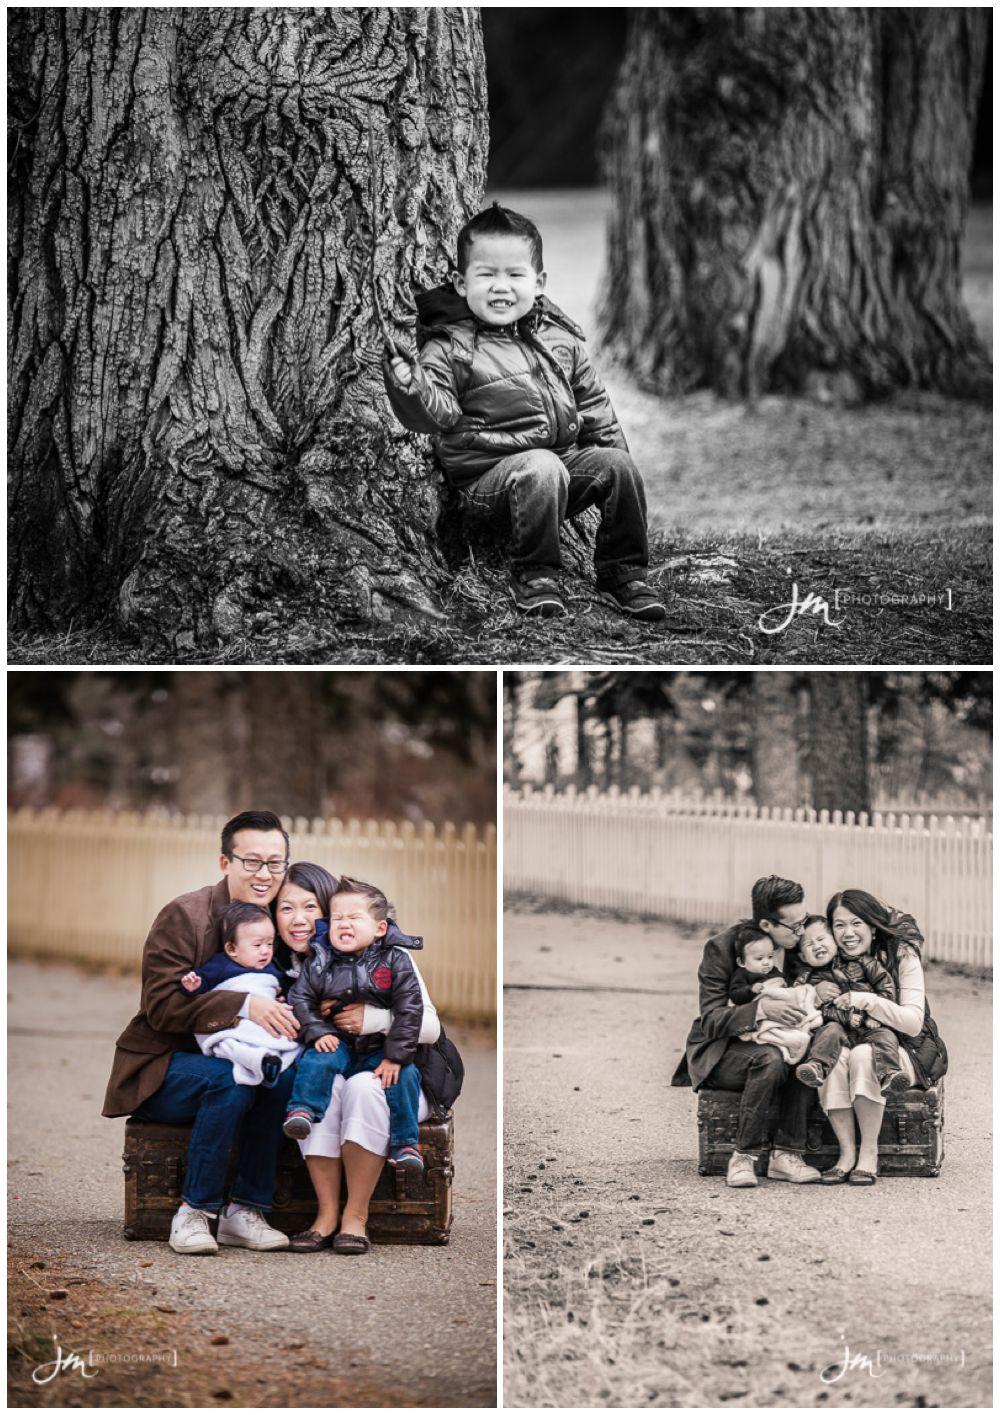 150315_046-Calgary-Family-Photographers-JM_Photography-Amy-Cheng-Fish-Creek-Park